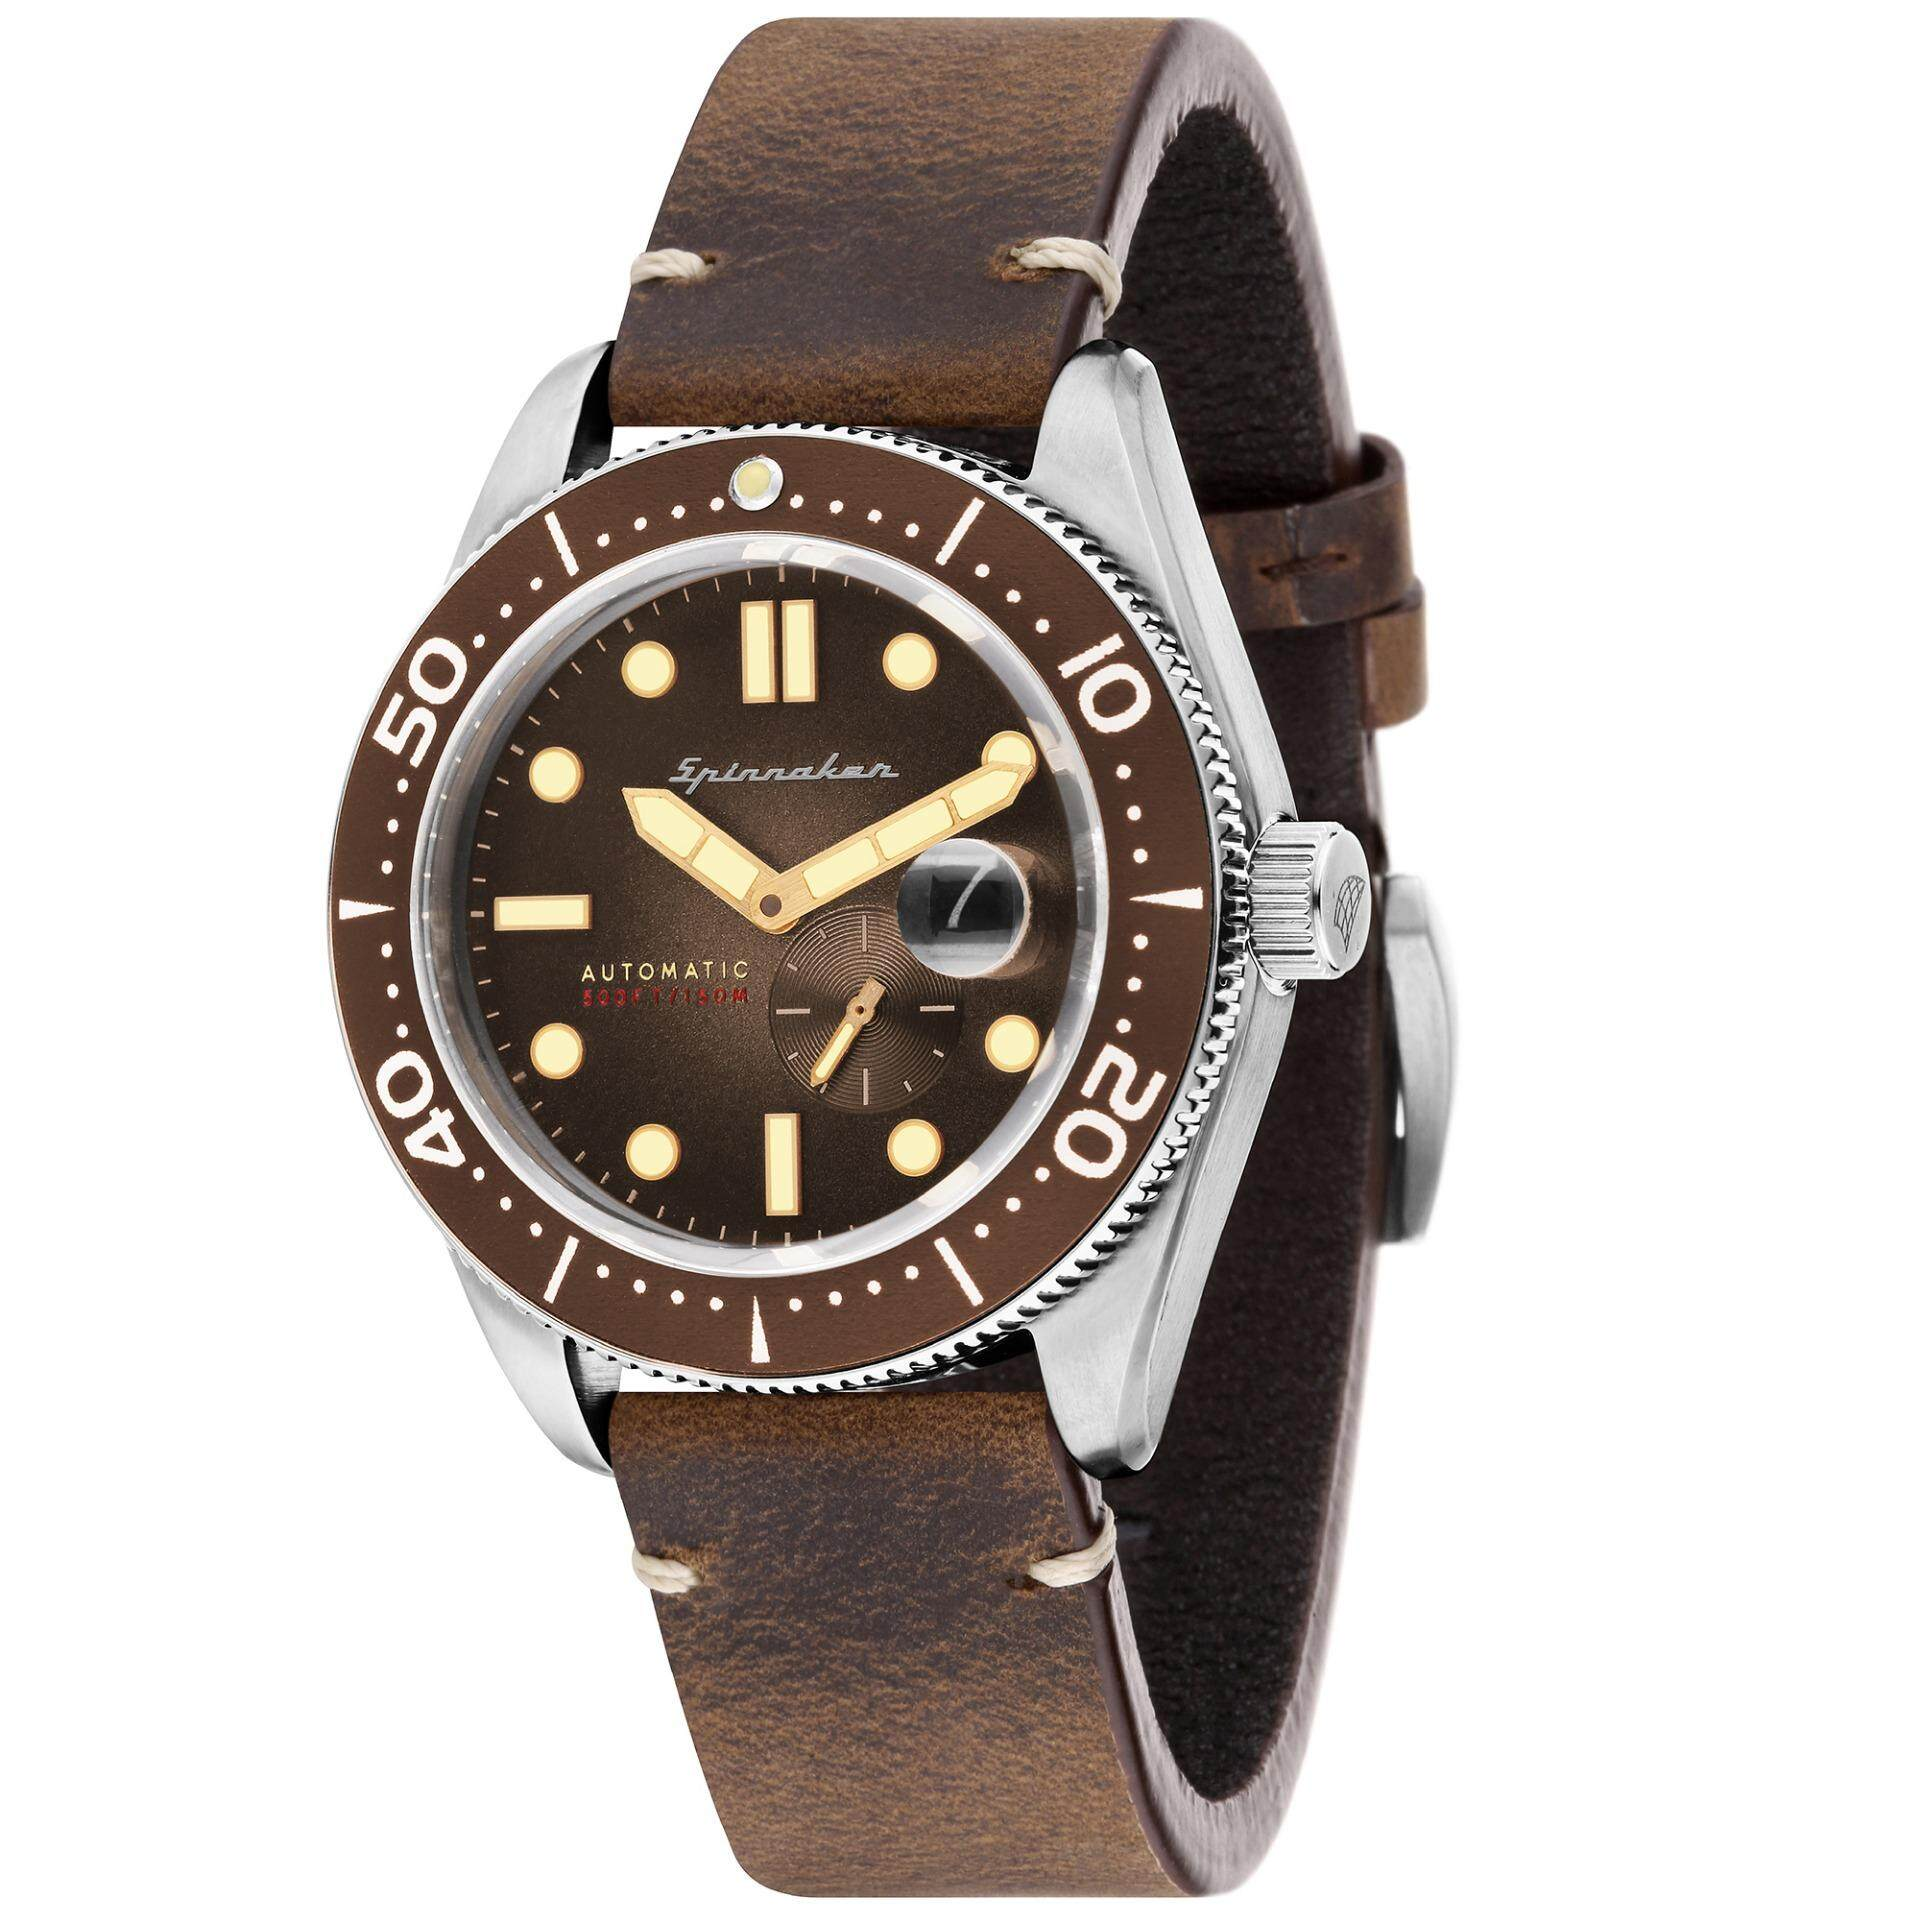 5142ee95ec9 Spinnaker CROFT SP-5058-02 Men s Brown Genuine Leather Strap Watch